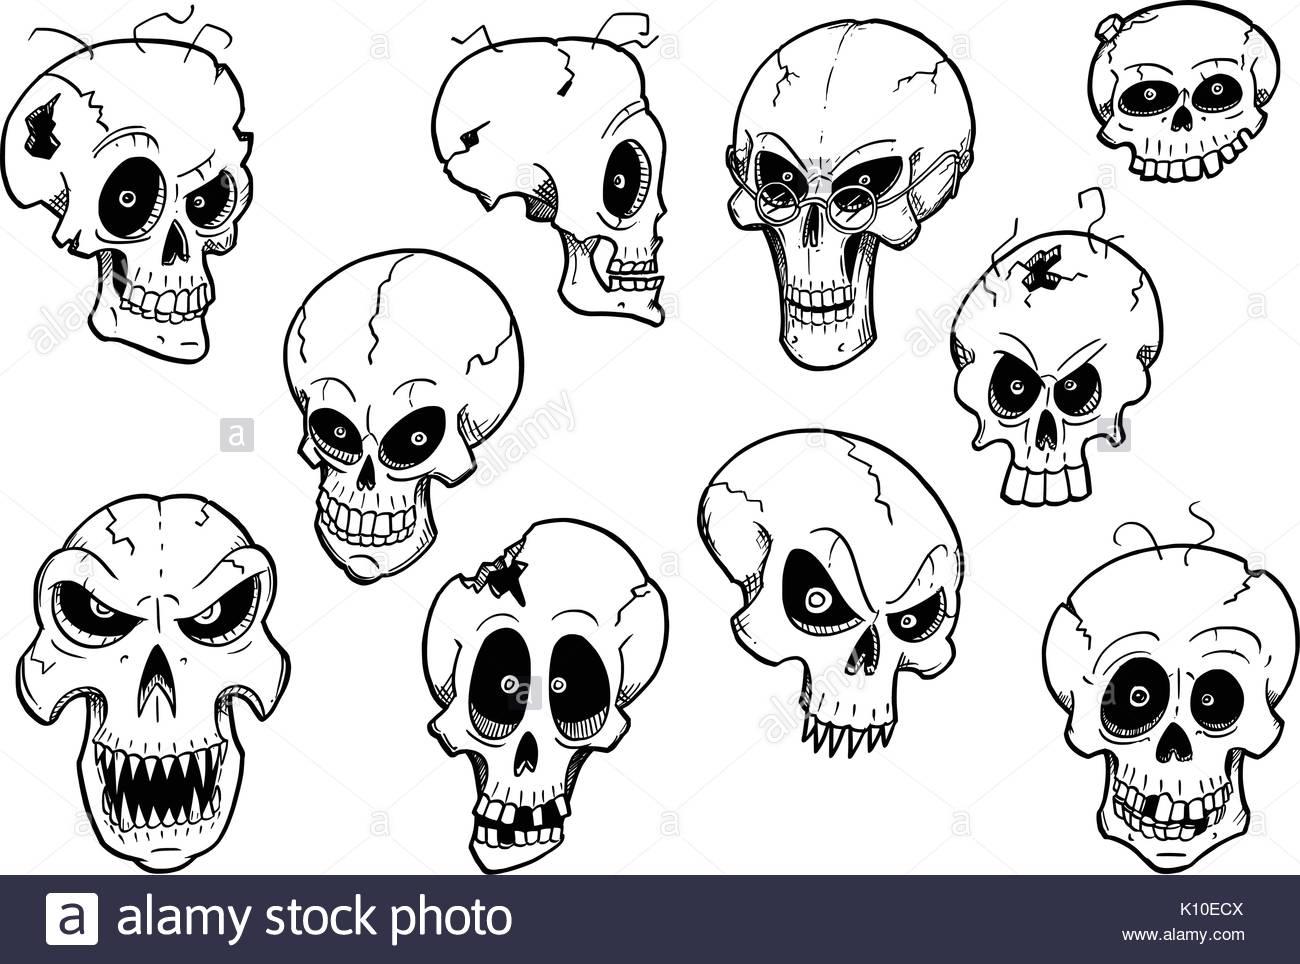 1300x964 Skull Drawing Stock Photos Amp Skull Drawing Stock Images